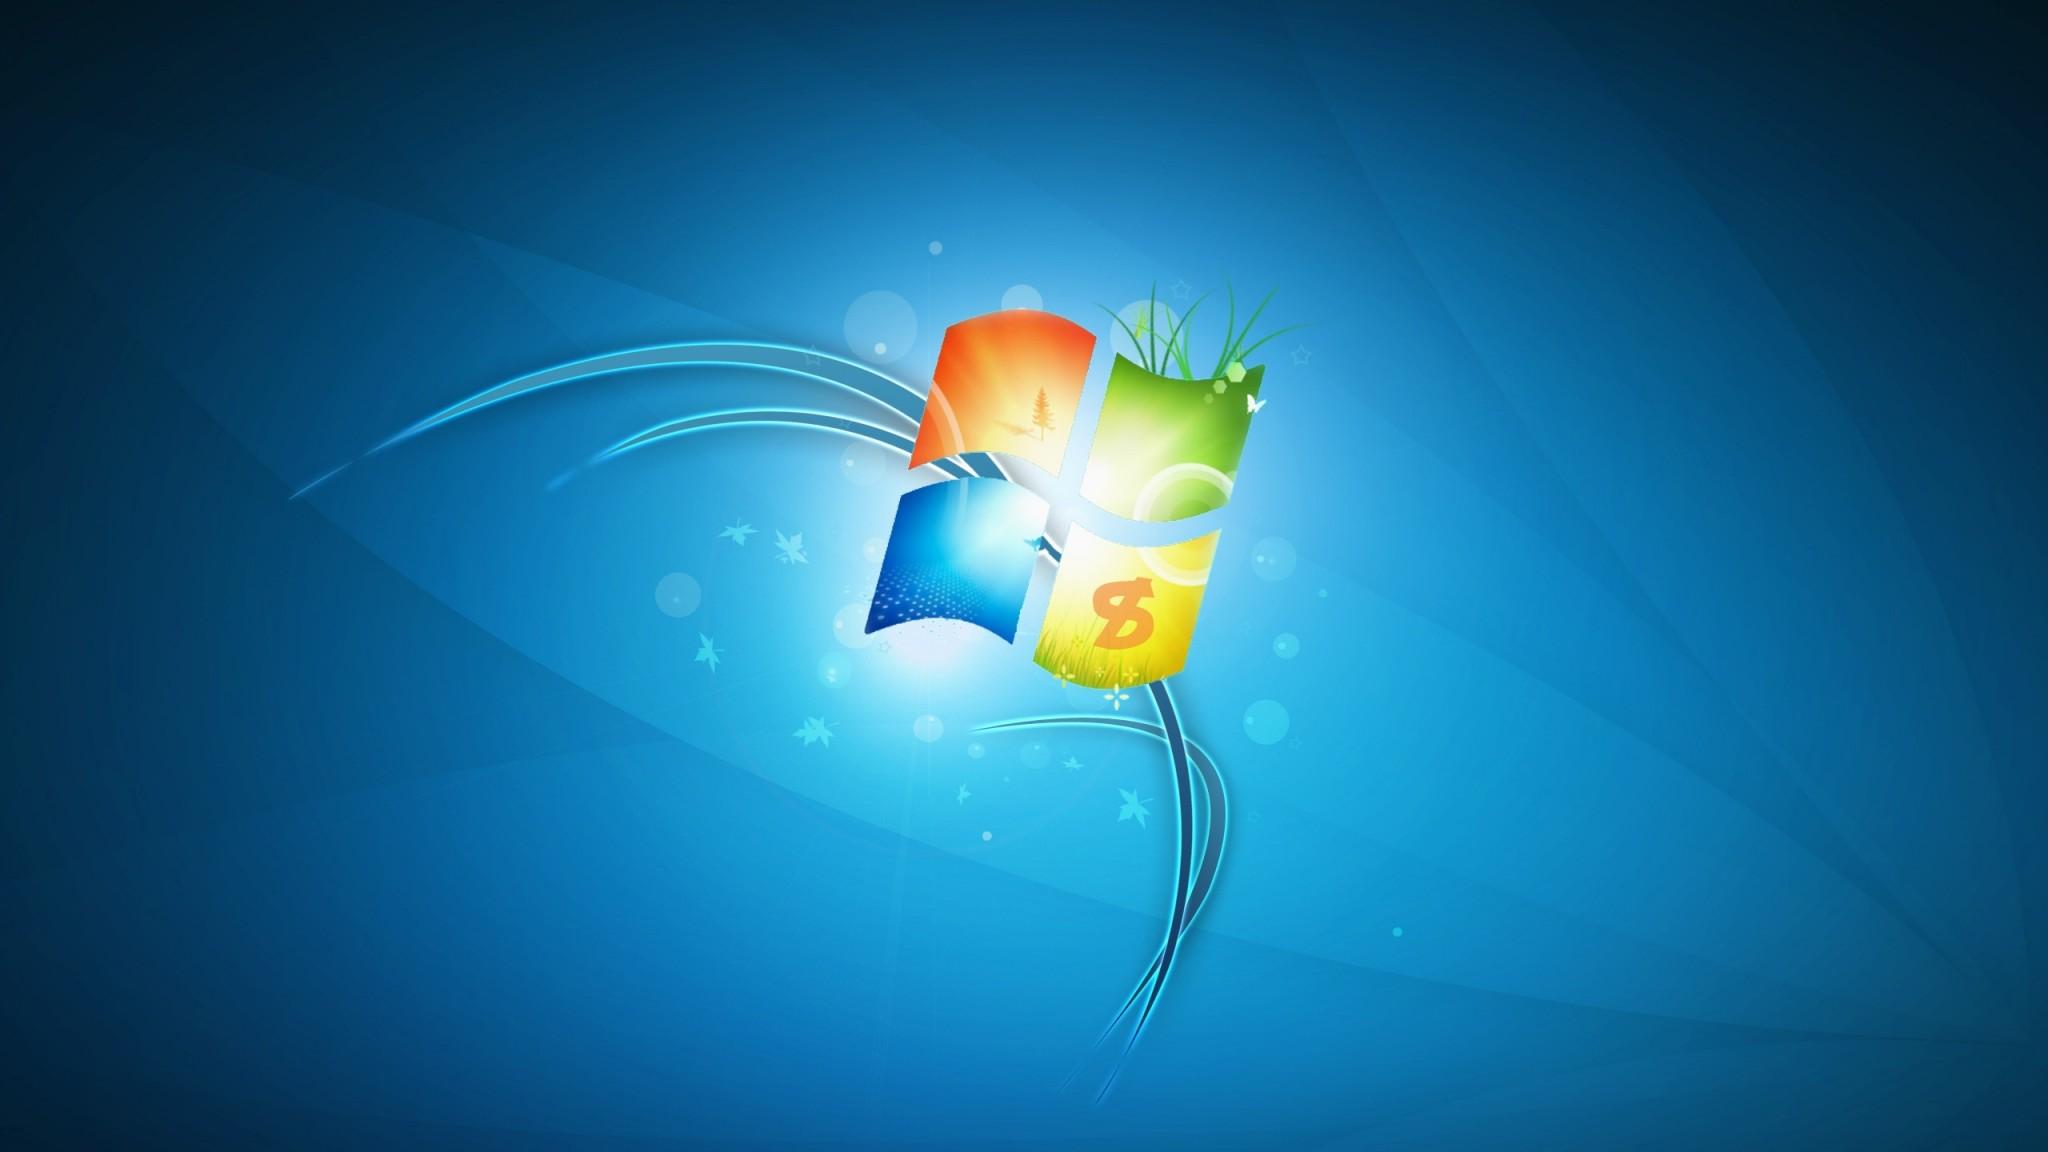 Windows 8 Natural Background HD Wallpaper